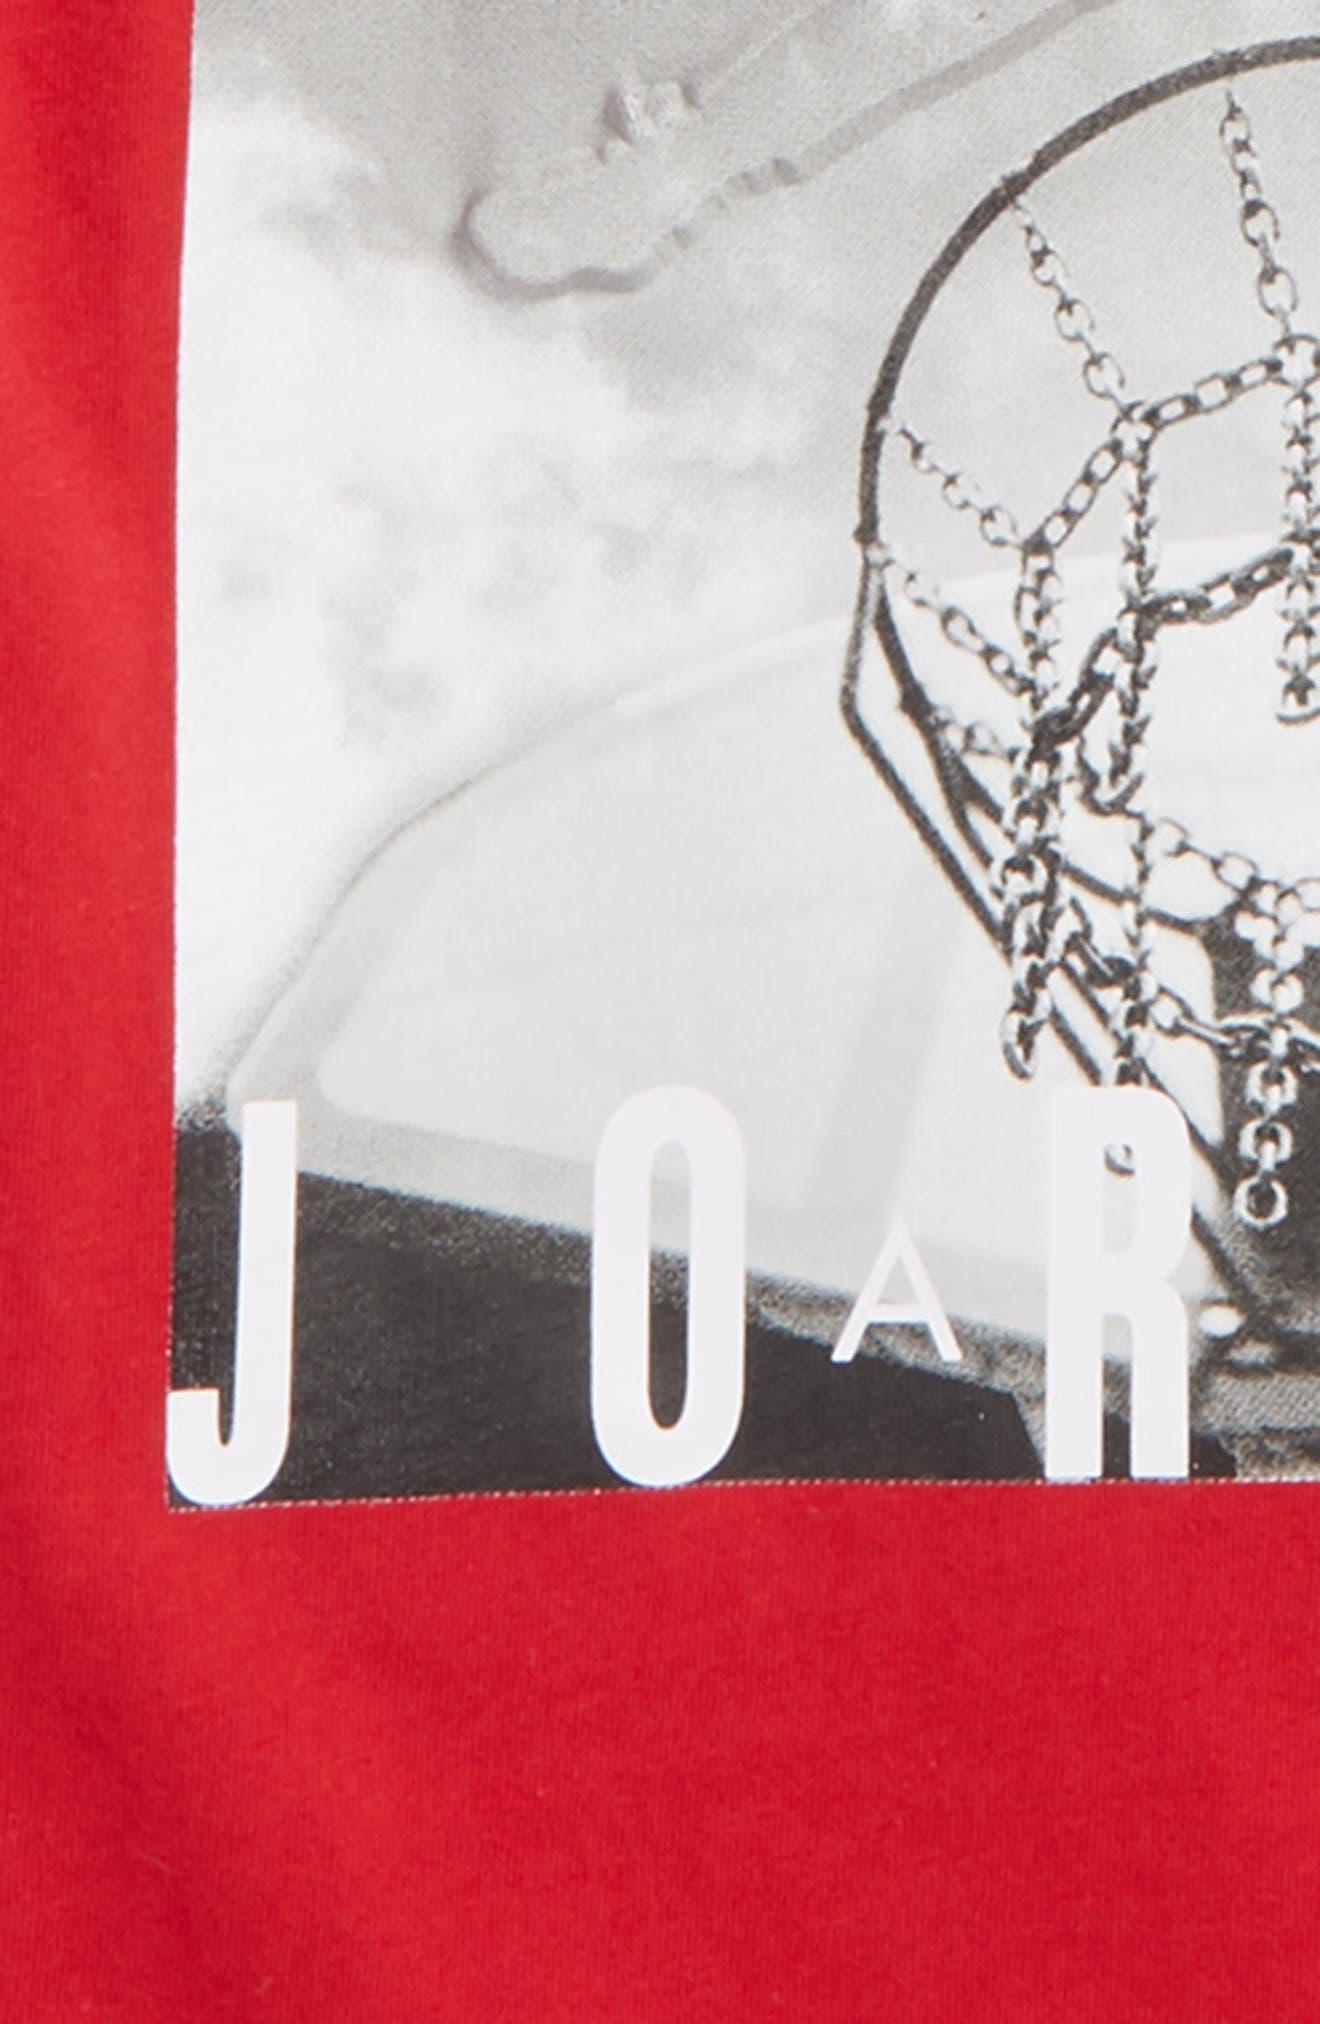 Jordan Hard Court Graphic T-Shirt,                             Alternate thumbnail 2, color,                             606